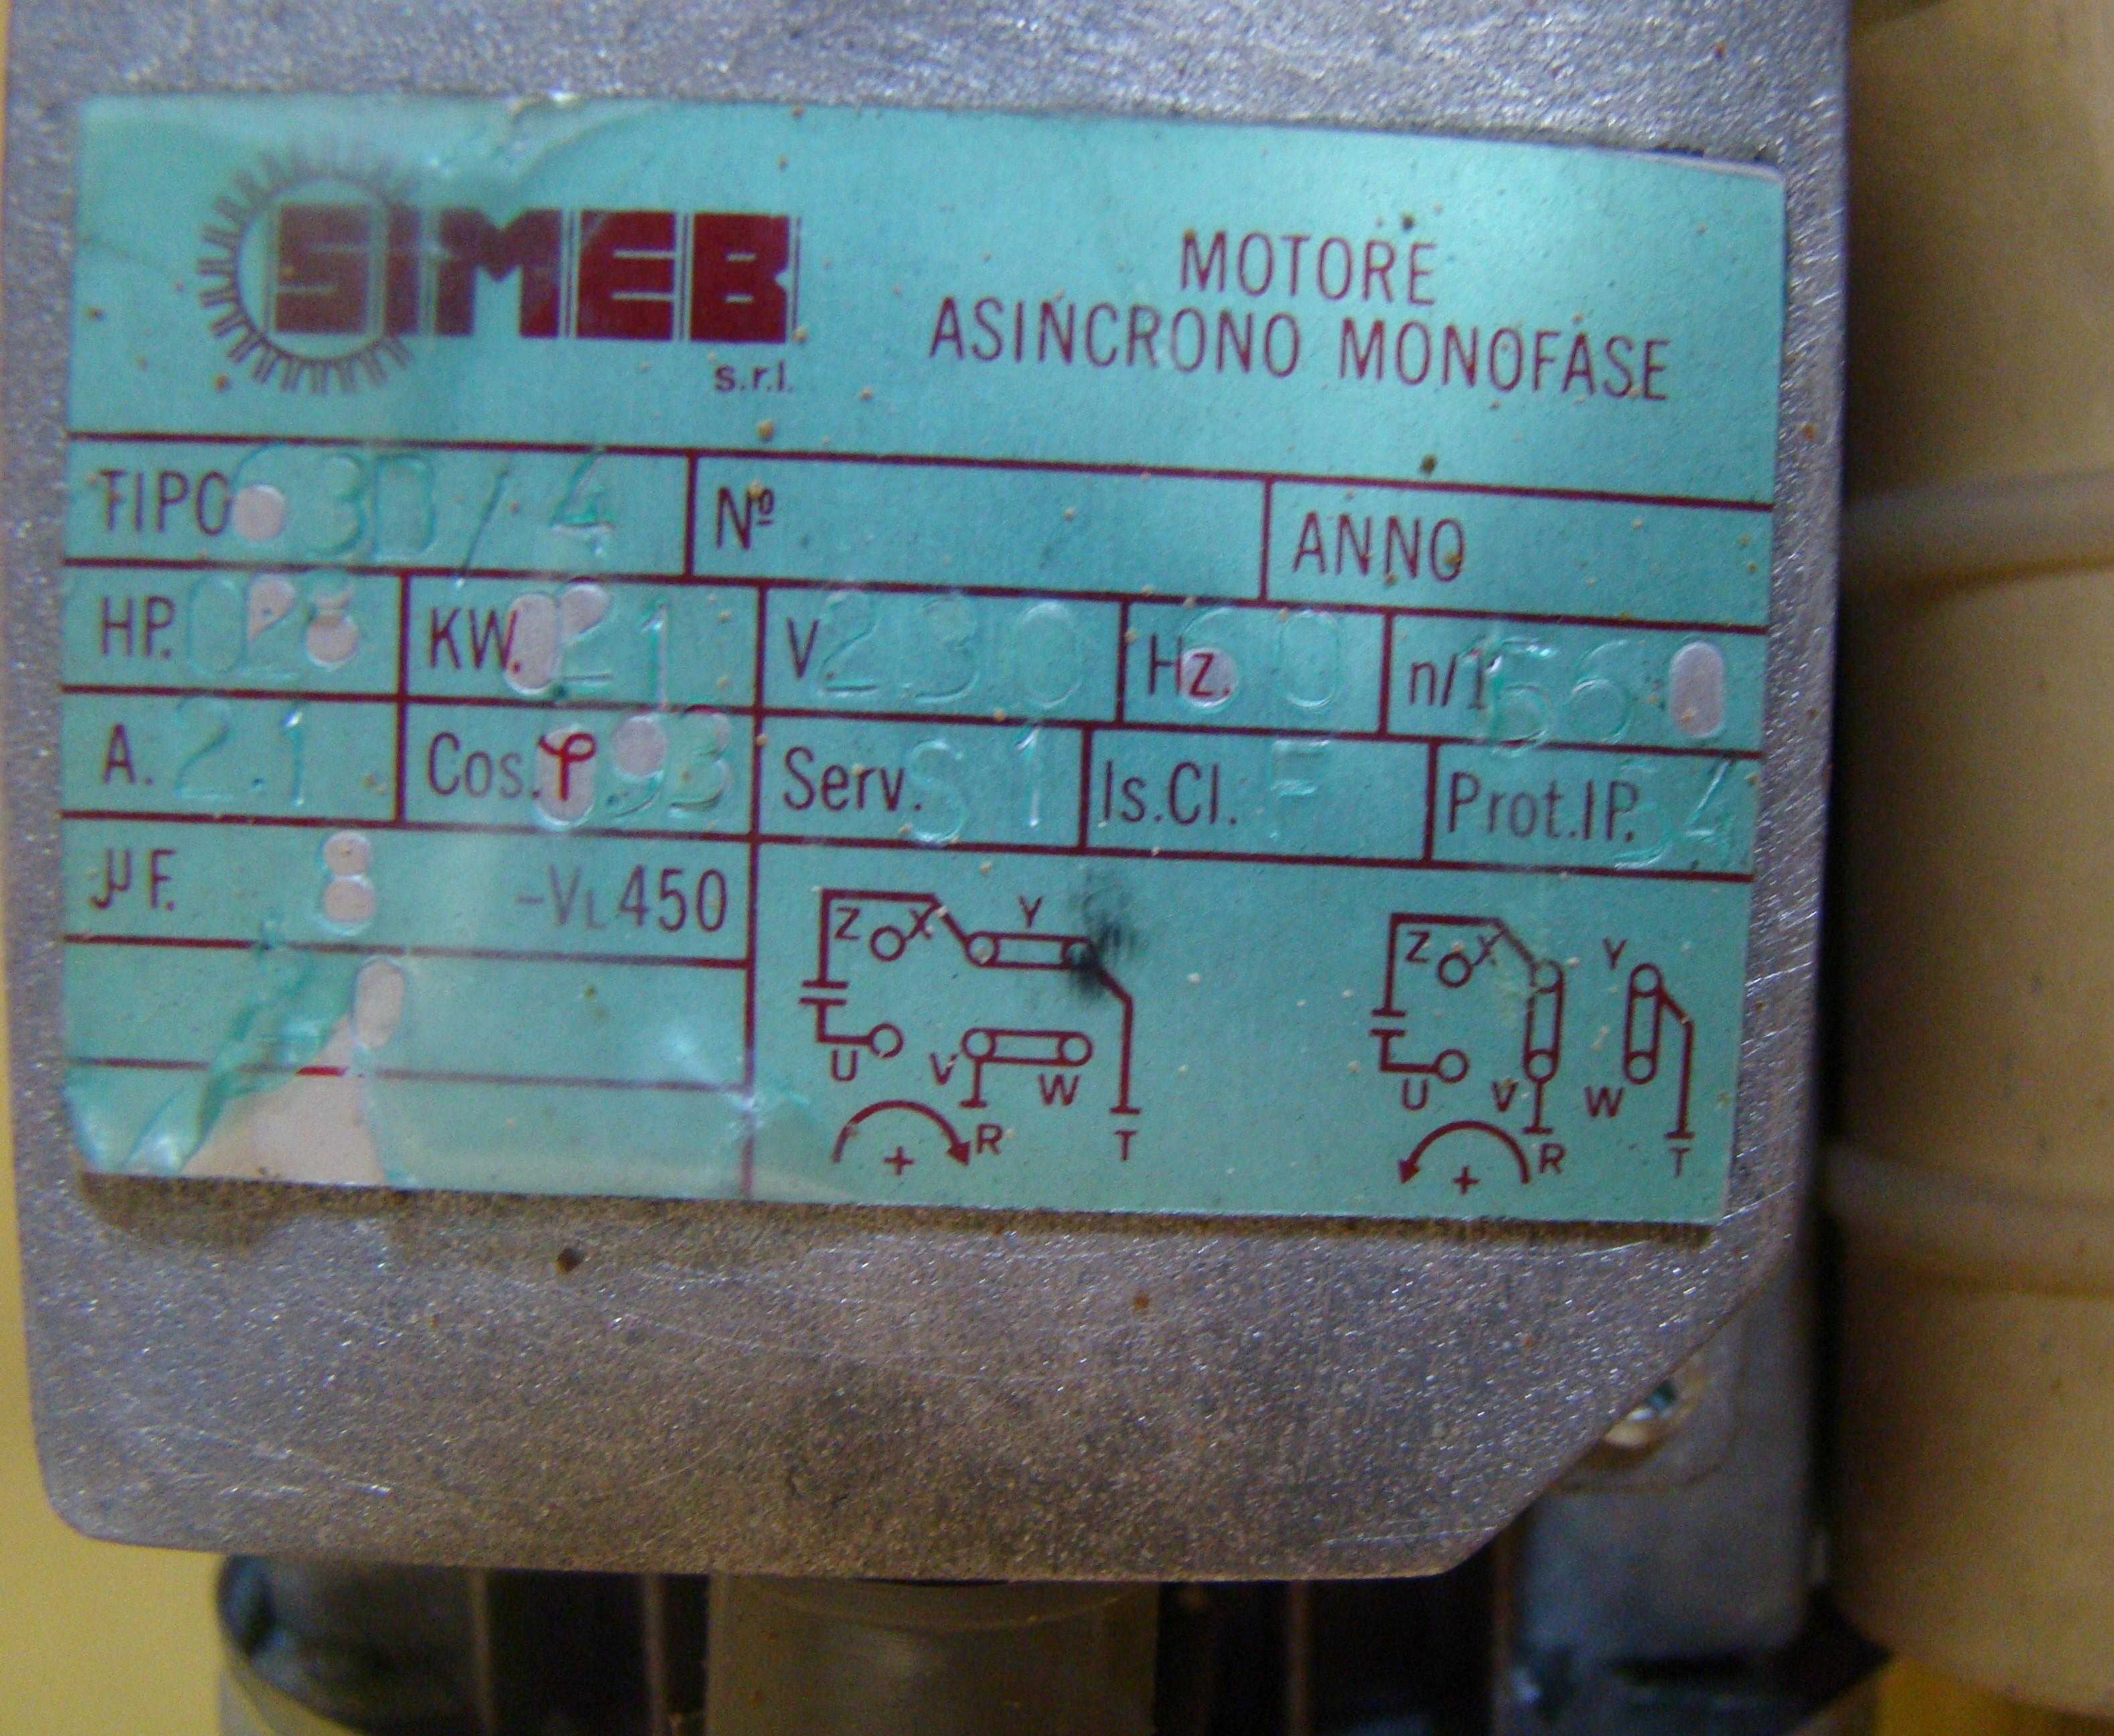 "SCMI Mini-Max 6"" Stroke Sander & Dust Collector Model #EE1500 230 Volt 1PH - Image 6 of 7"